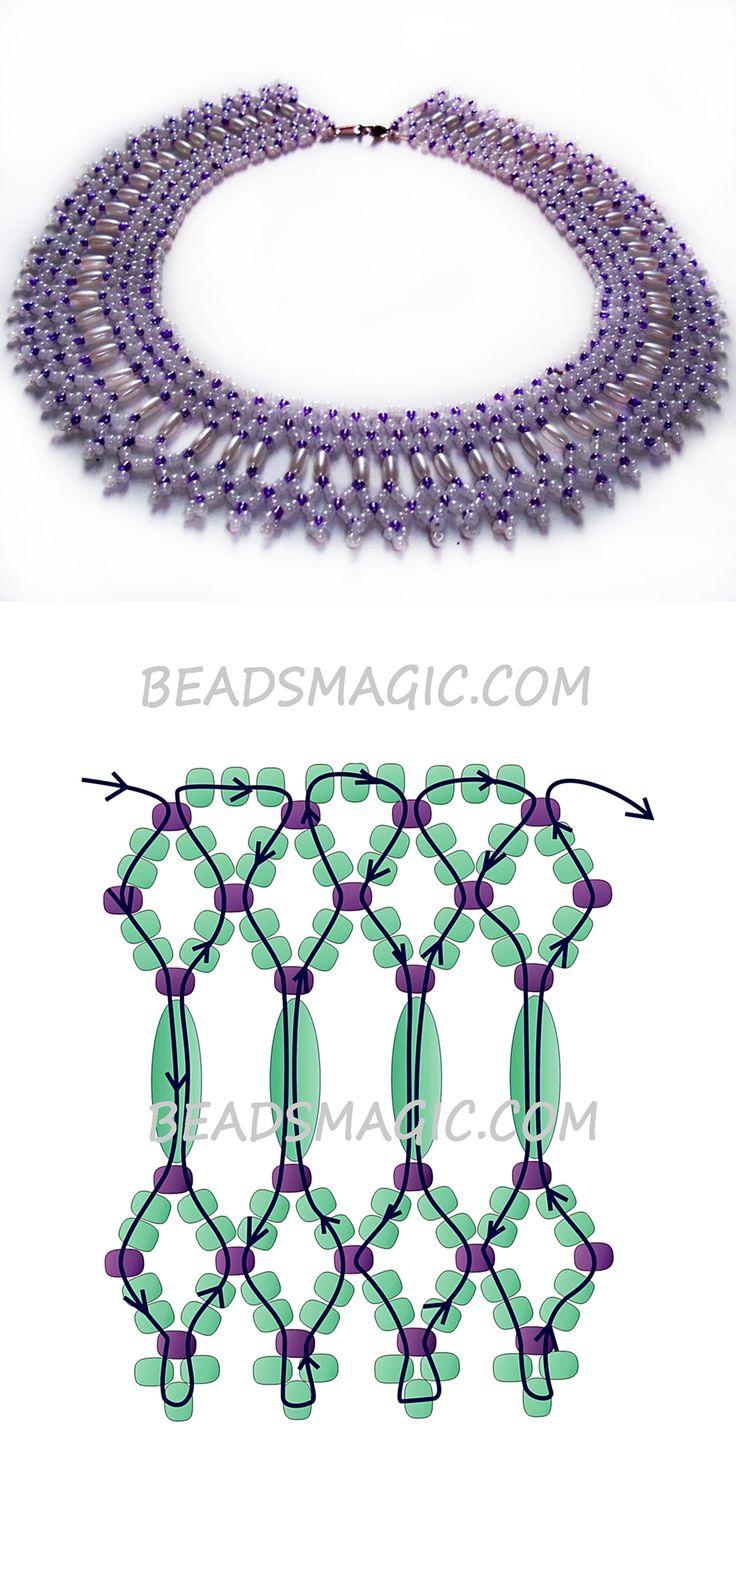 Free pattern for necklace Fame rizs helyett-szalma